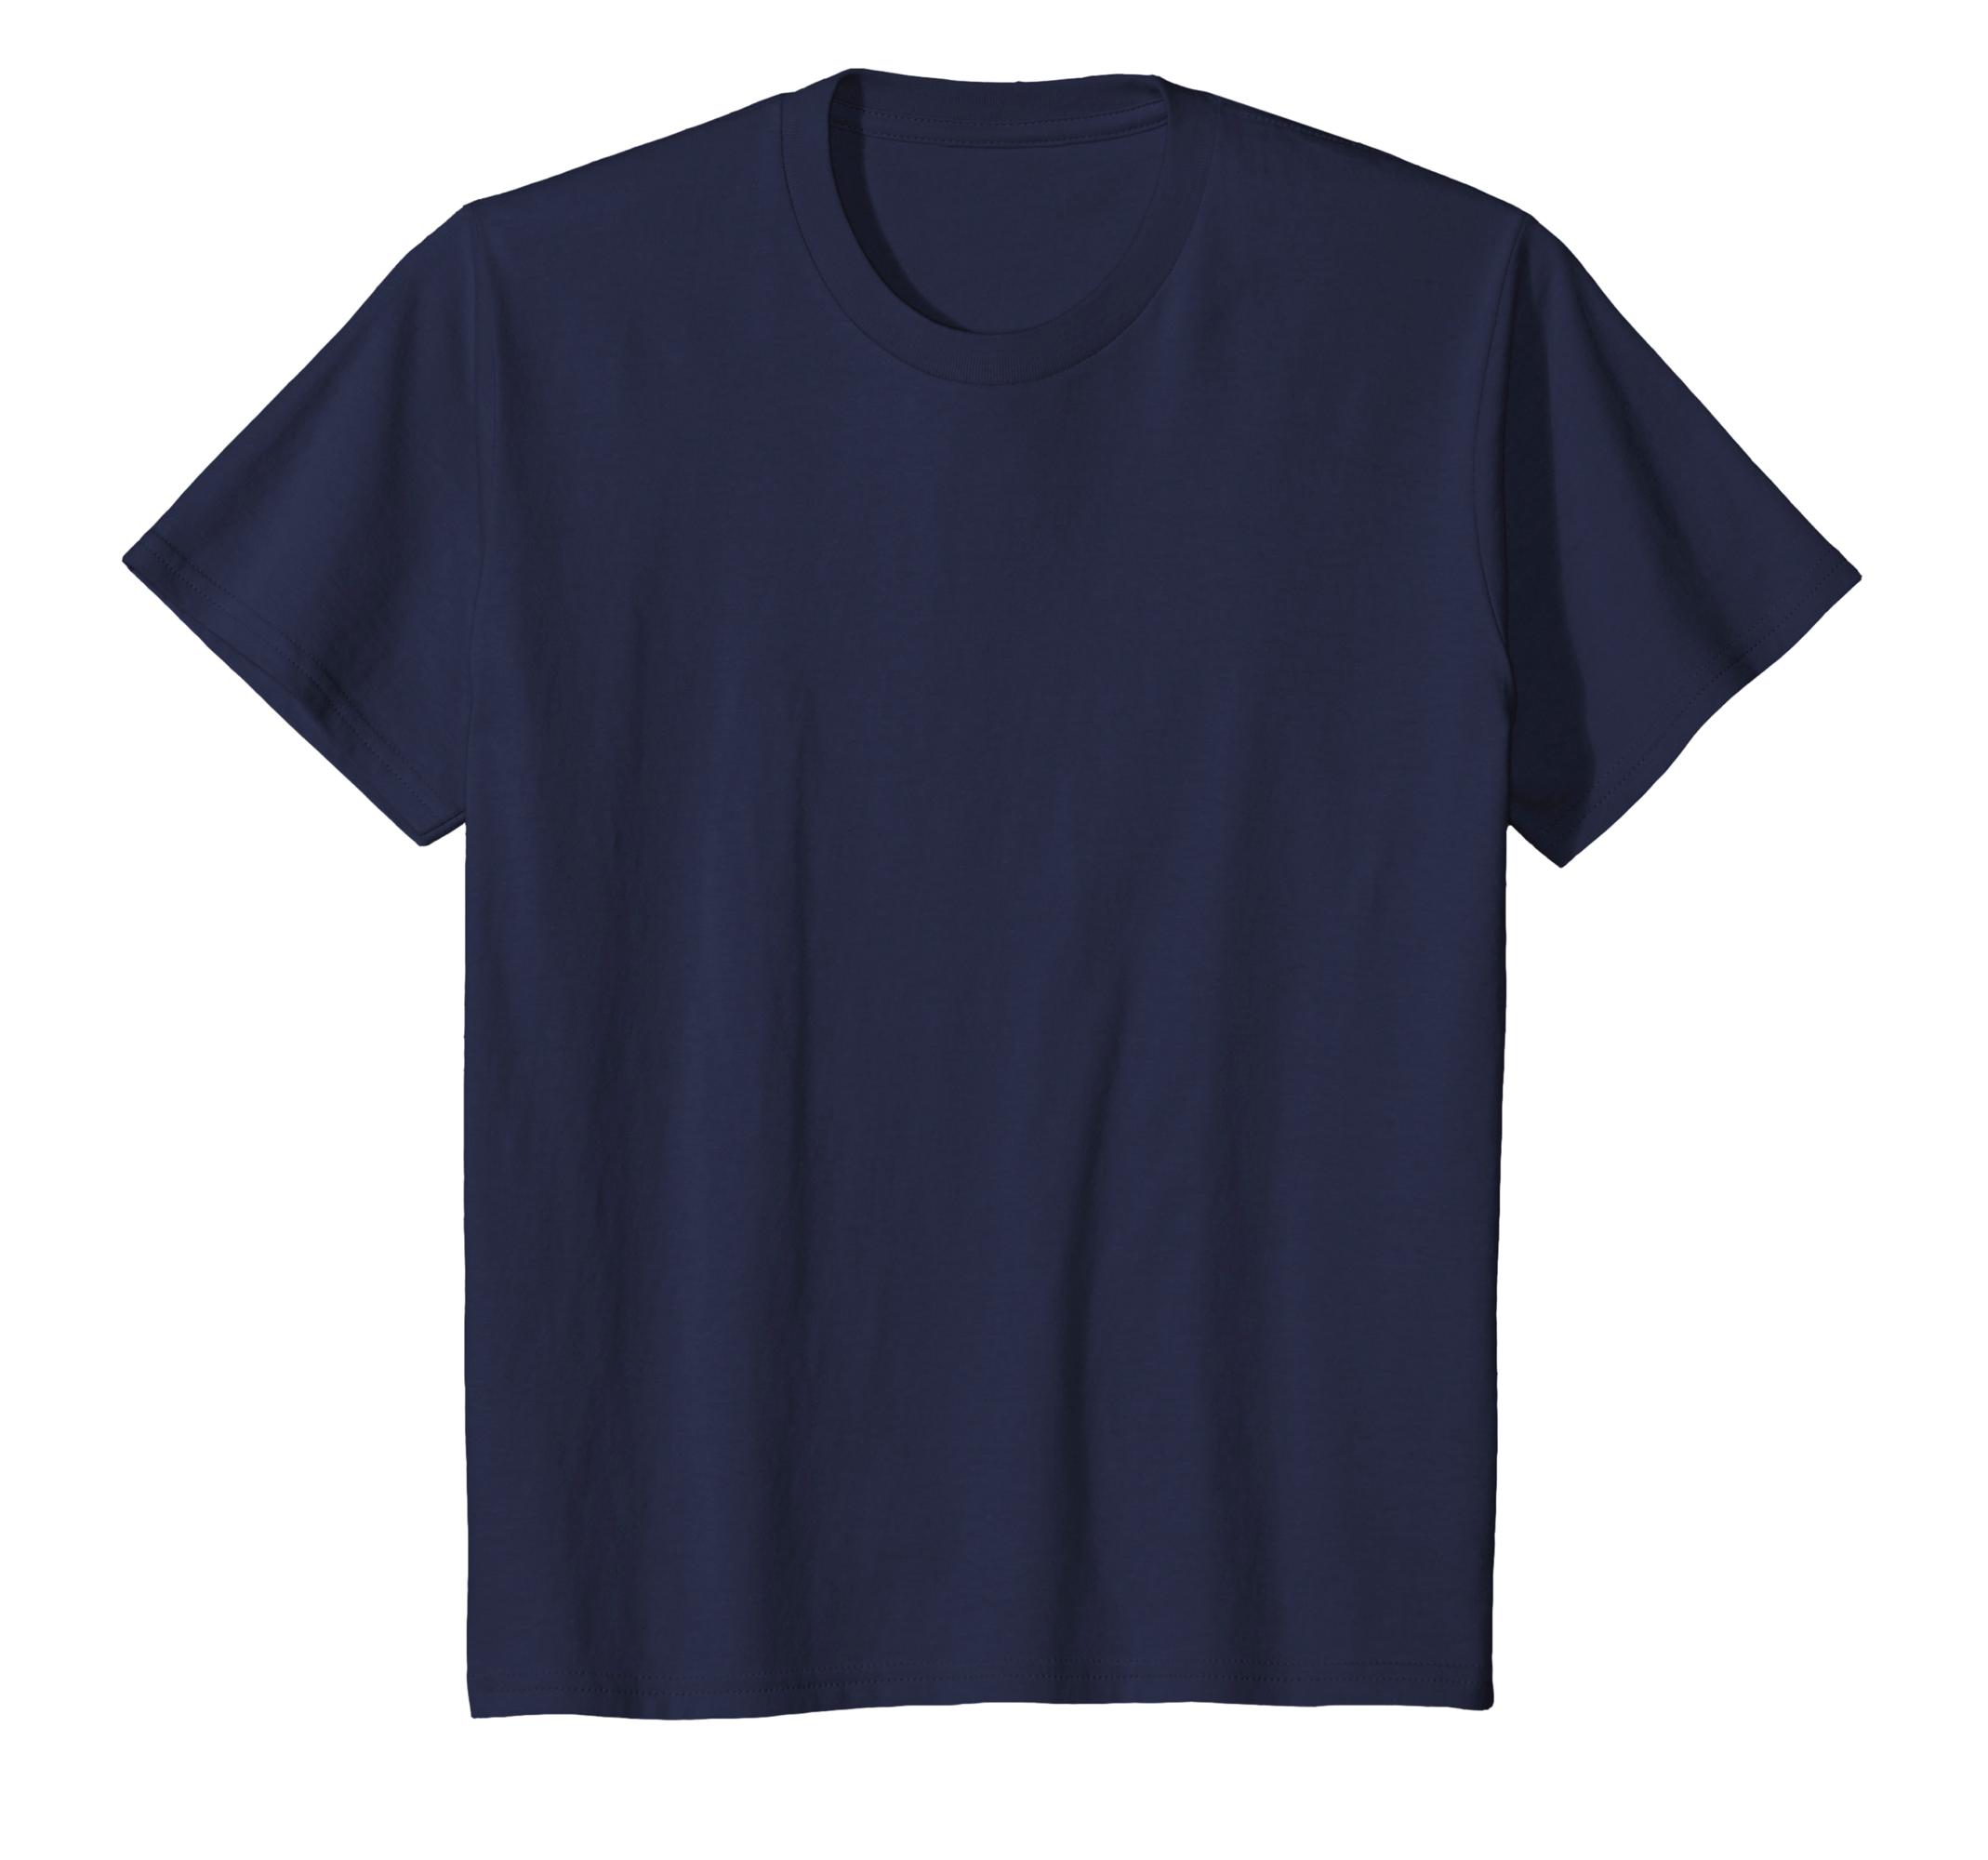 Cooles Angel Fun T-Shirt Angeln und Bier bedruckt Angler  Fischen Fishing